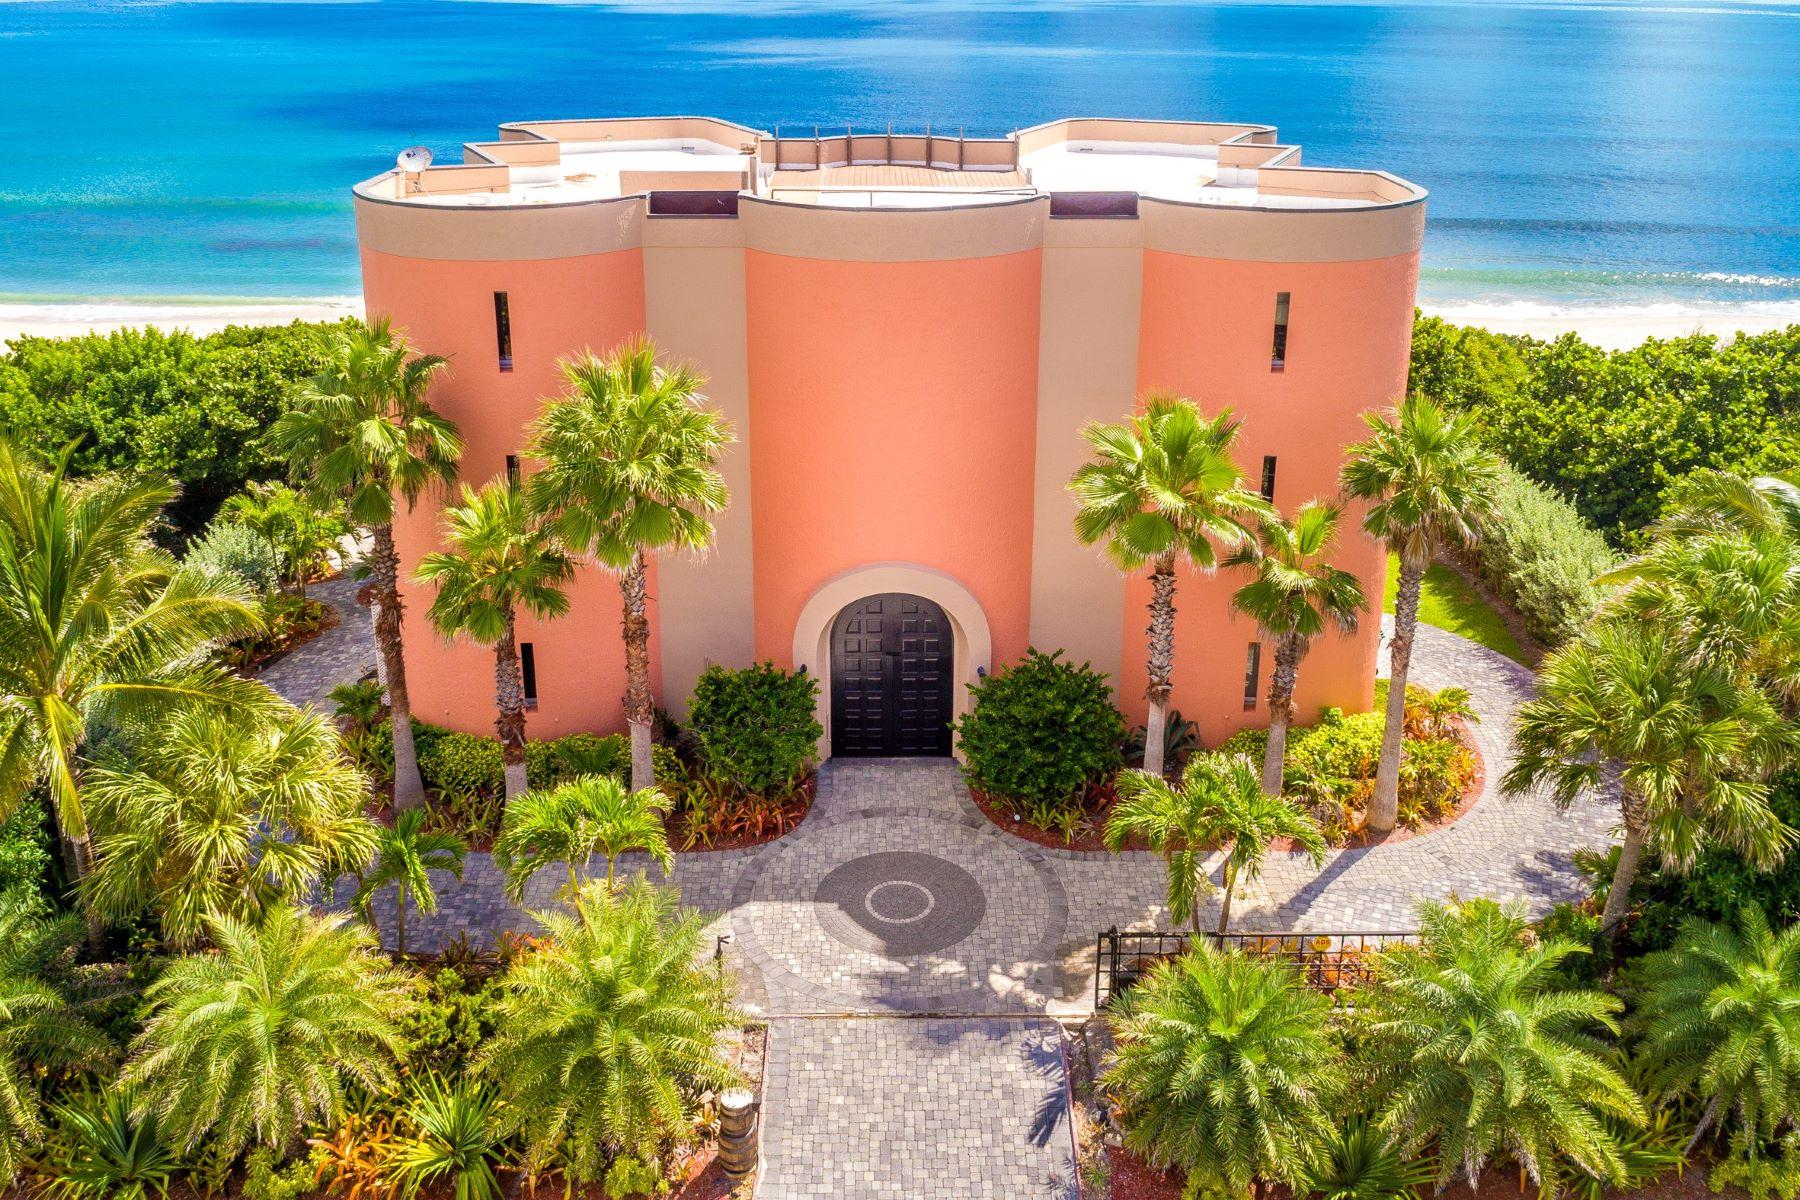 Single Family Homes för Försäljning vid Iconic and One of a Kind Castle 7525 S Highway A1a Melbourne Beach, Florida 32951 Förenta staterna